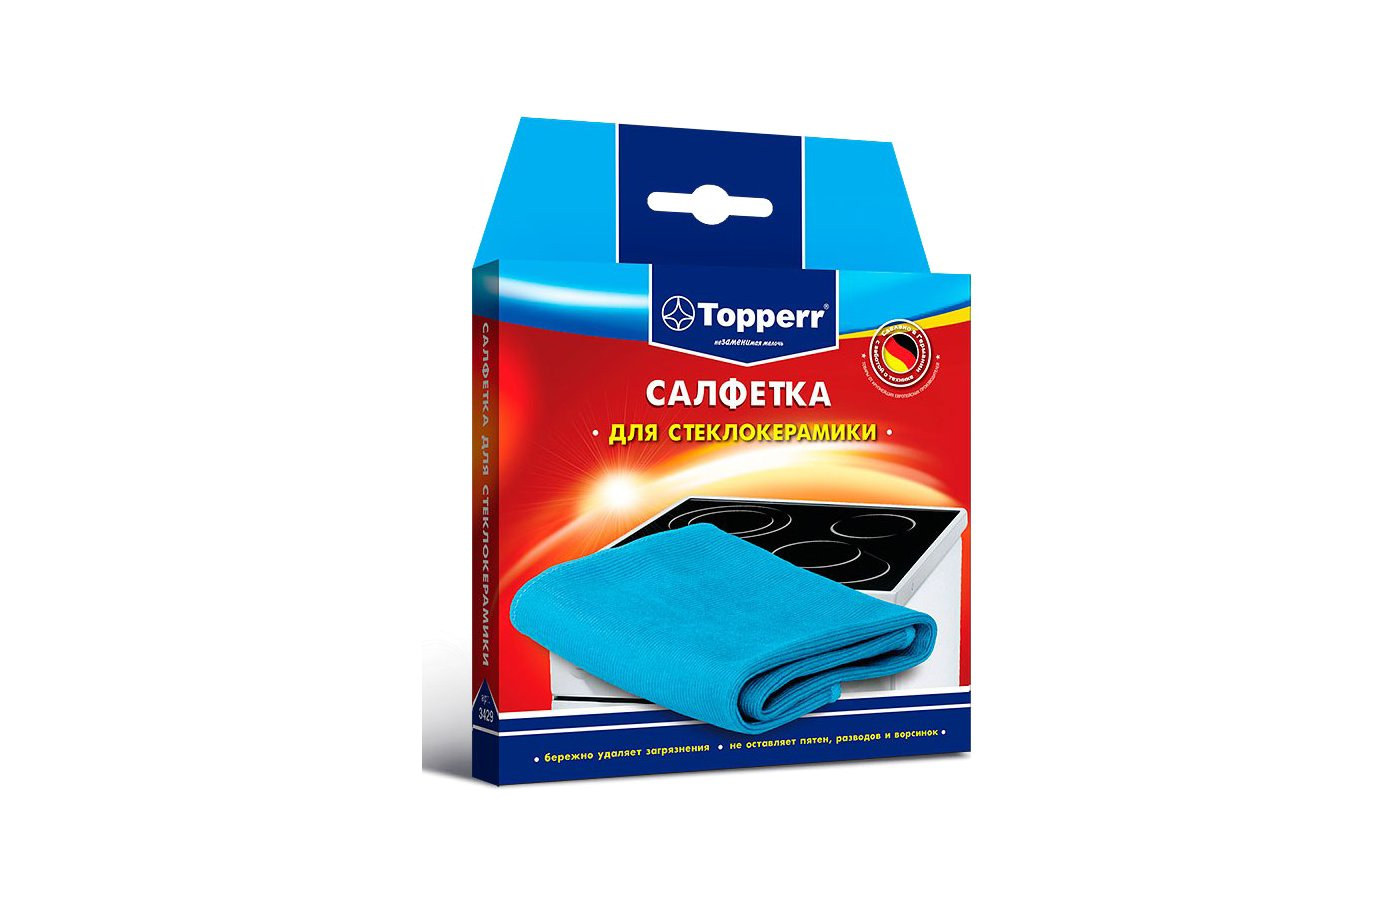 Салфетка TOPPERR 3429 для ухода за стеклокерамикой